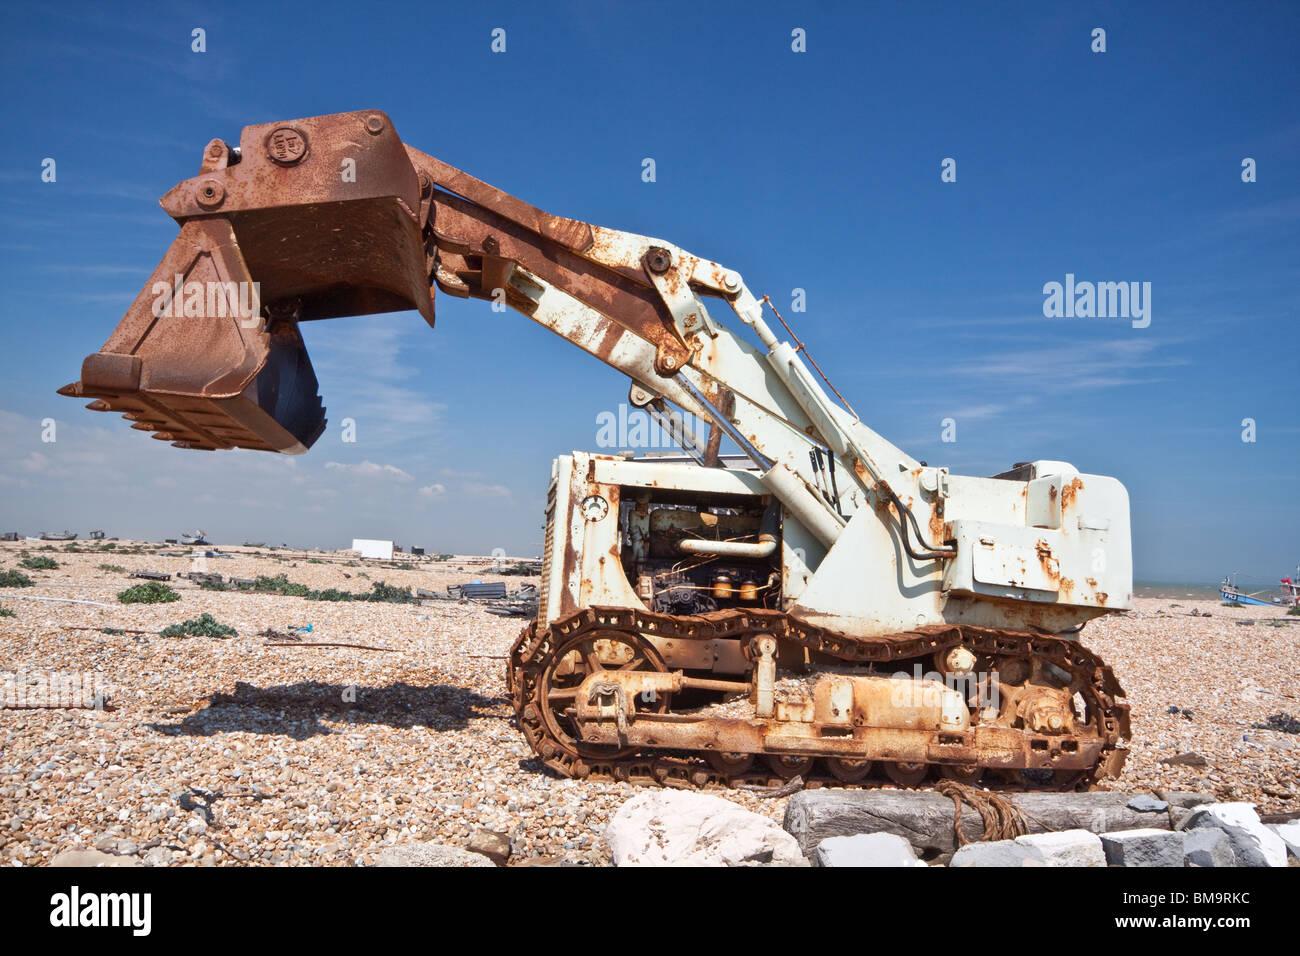 Caterpillar Bulldozer Tractor on Dungeness Beach - Stock Image